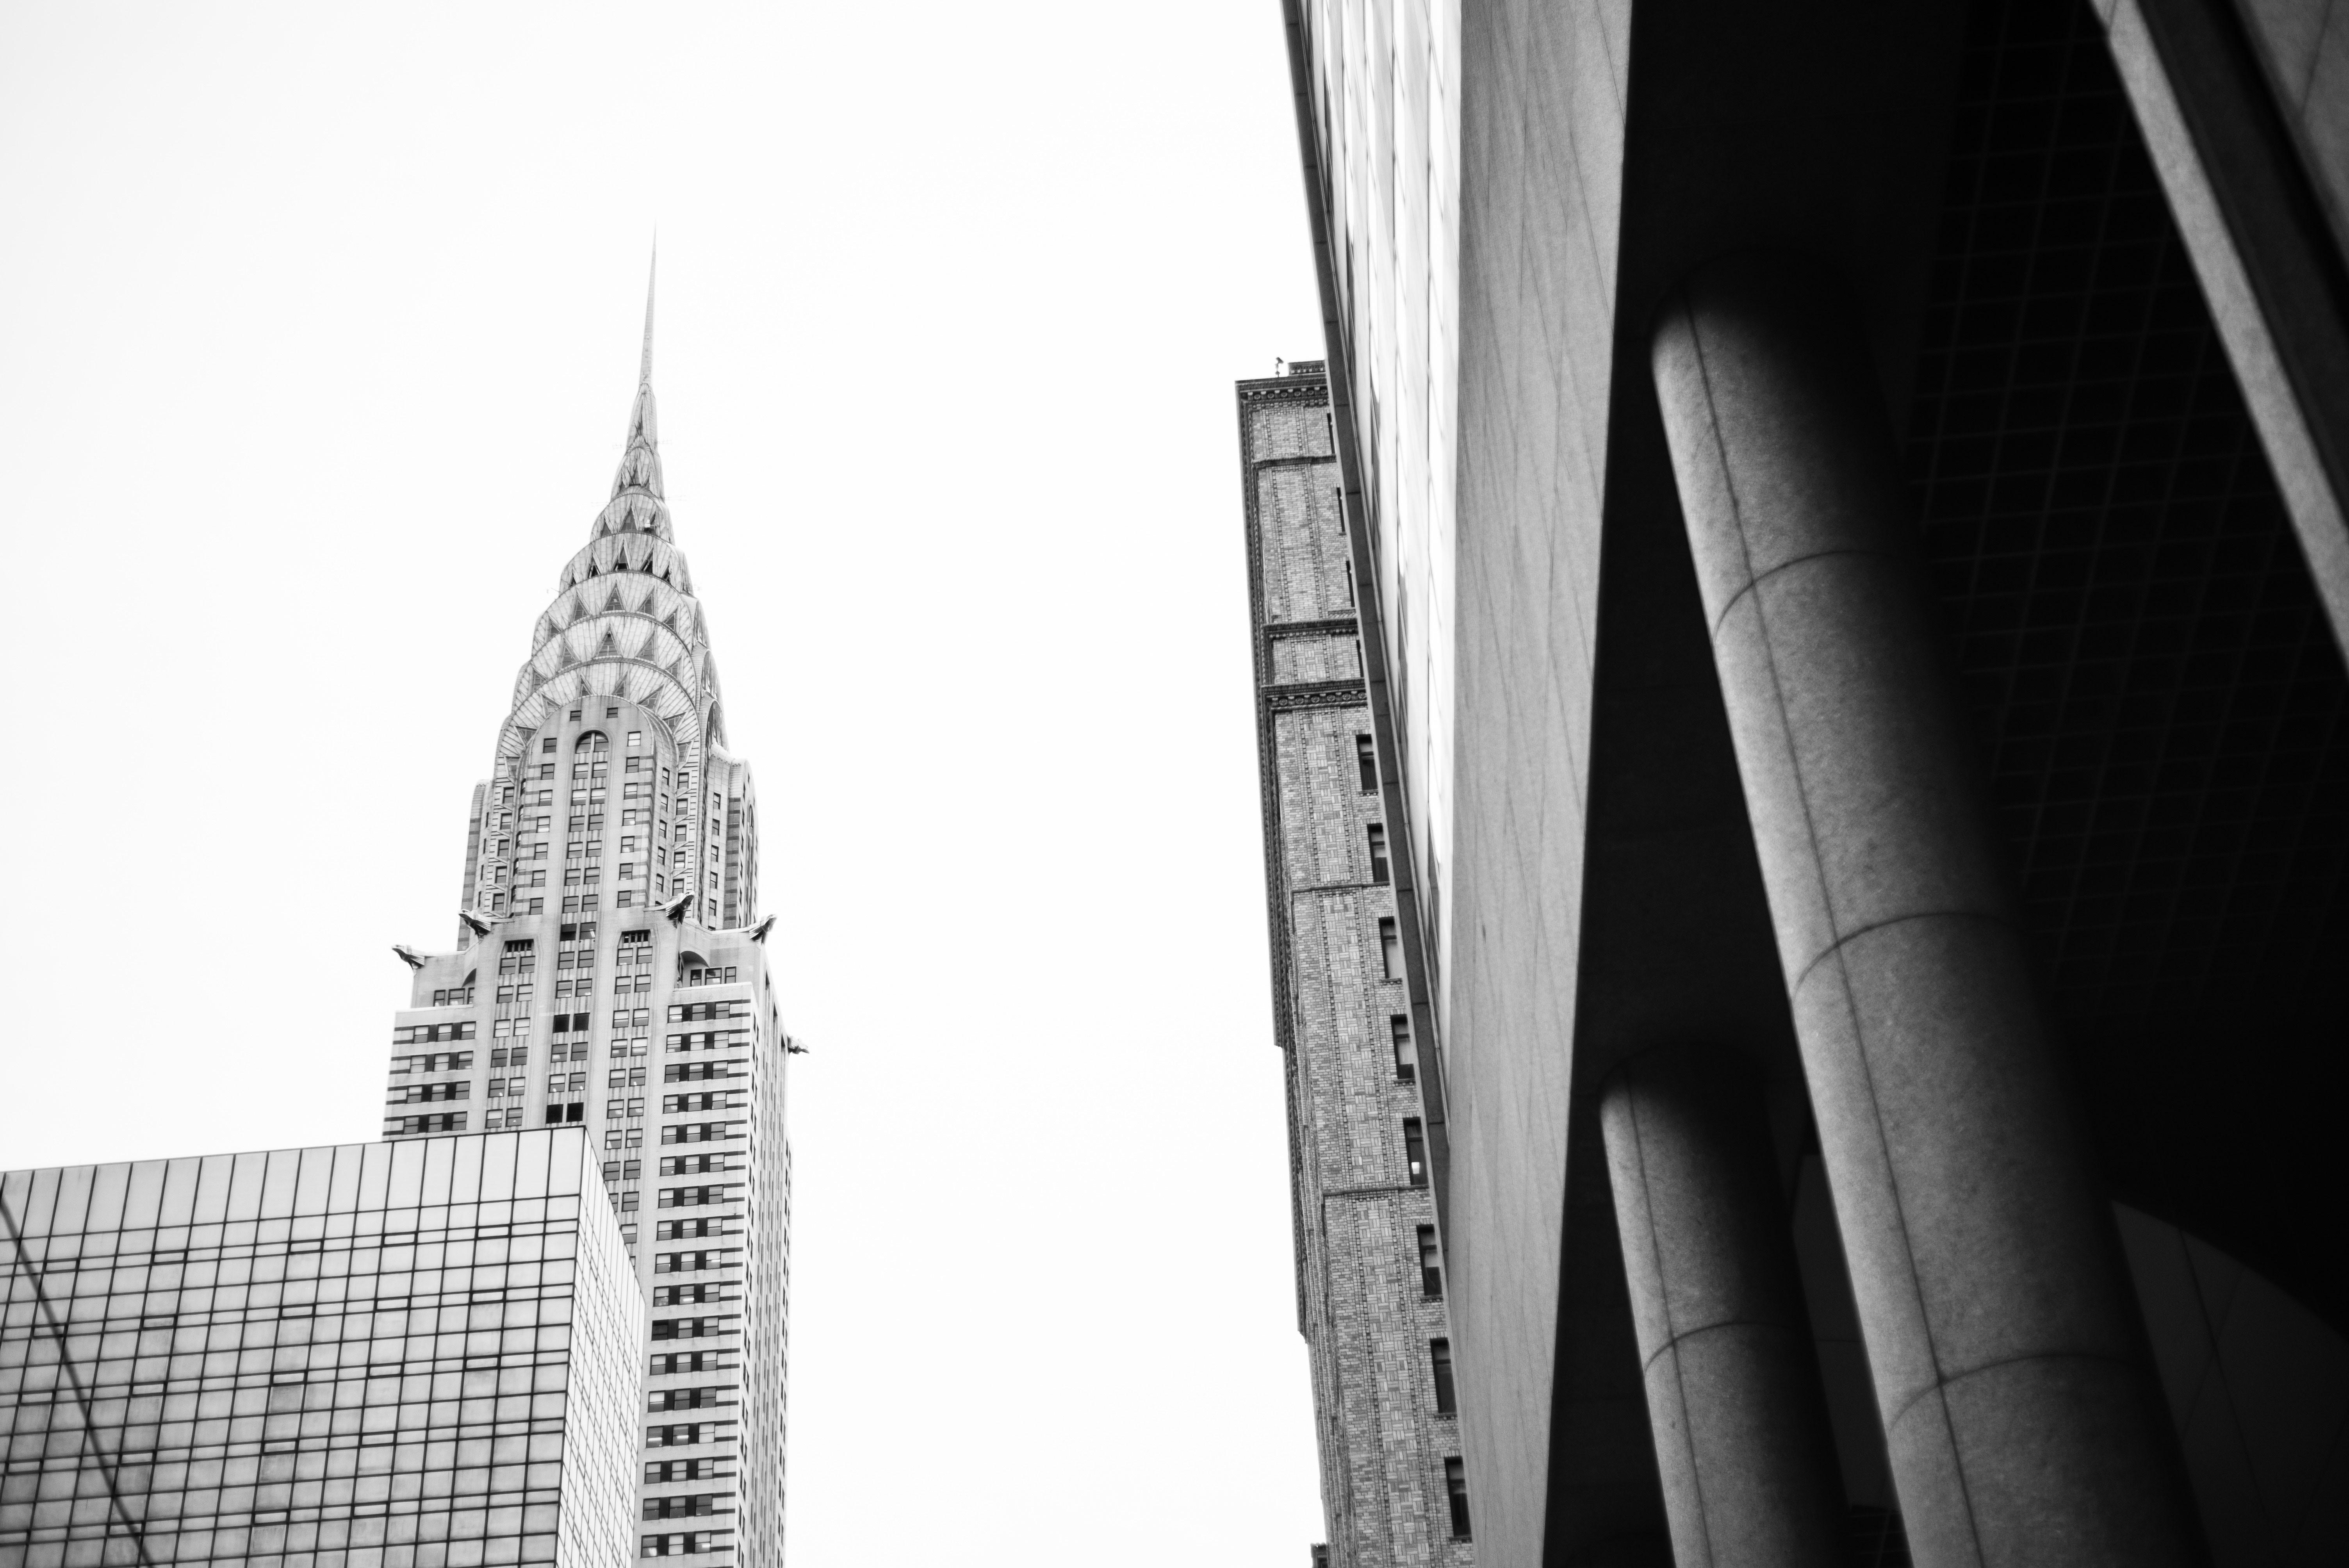 克莱斯勒大厦(Chrysler Building)